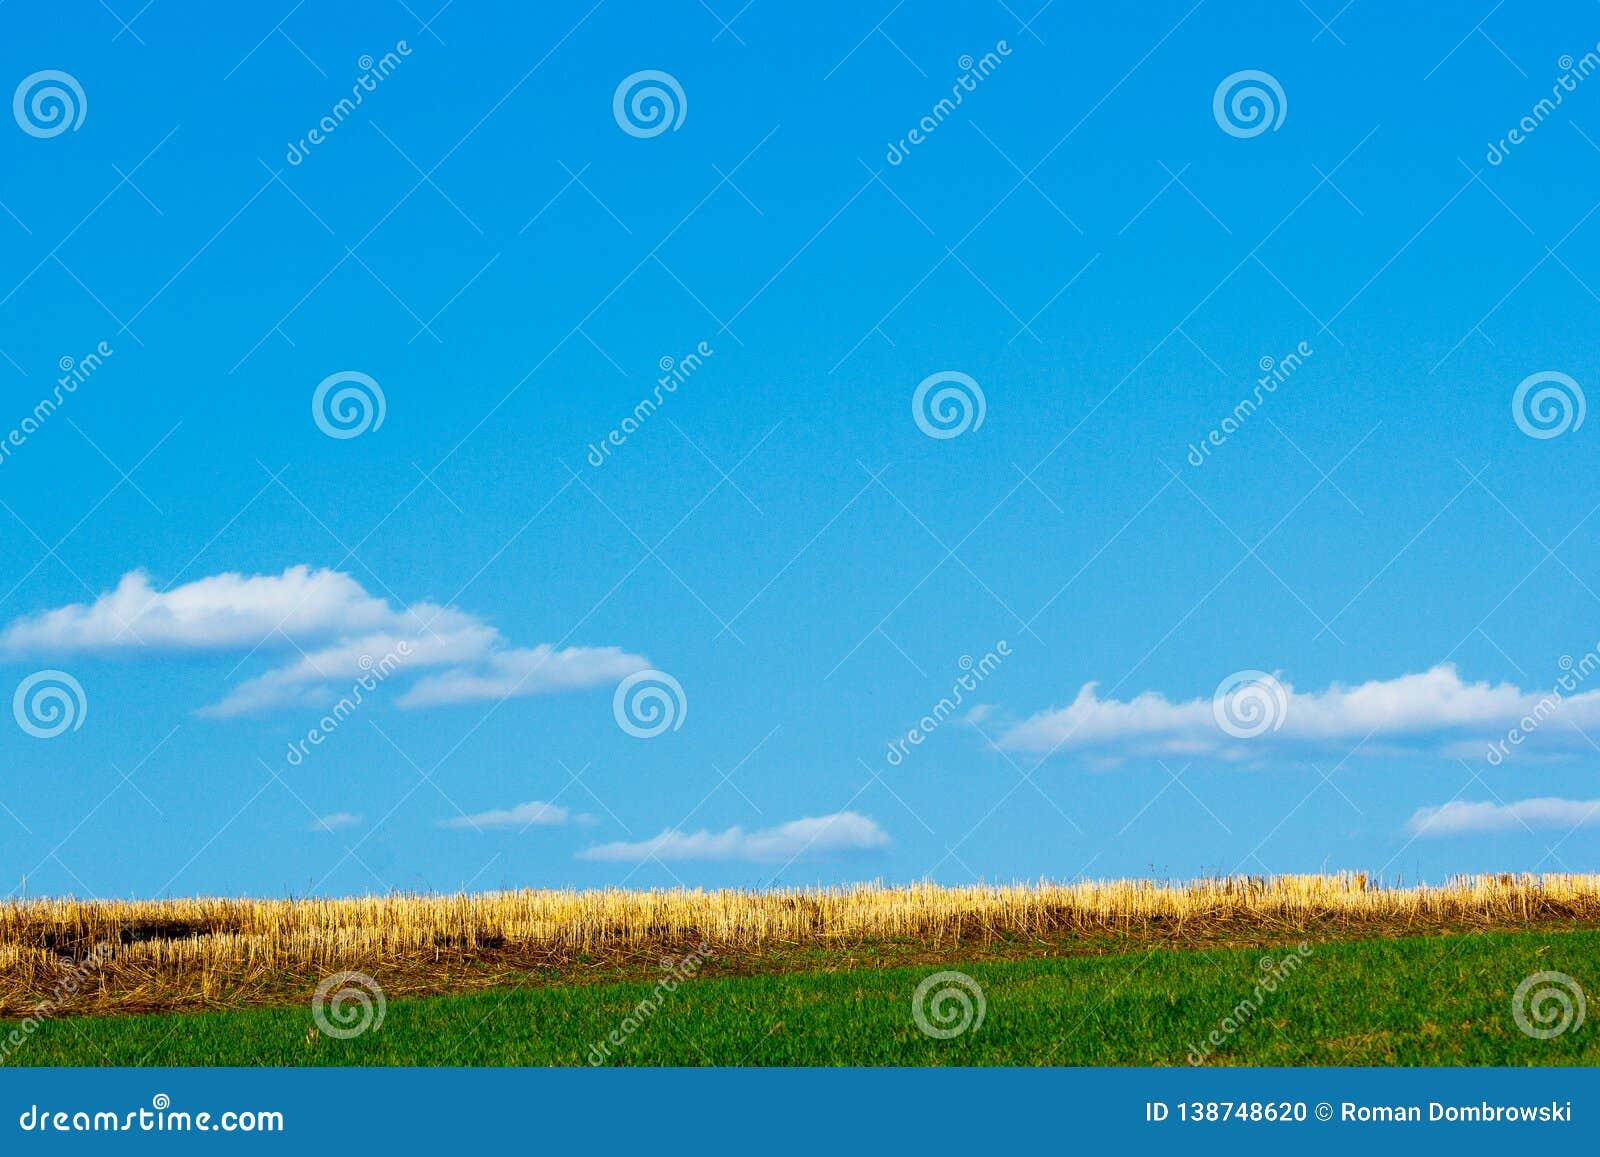 Beveled stalks of wheat